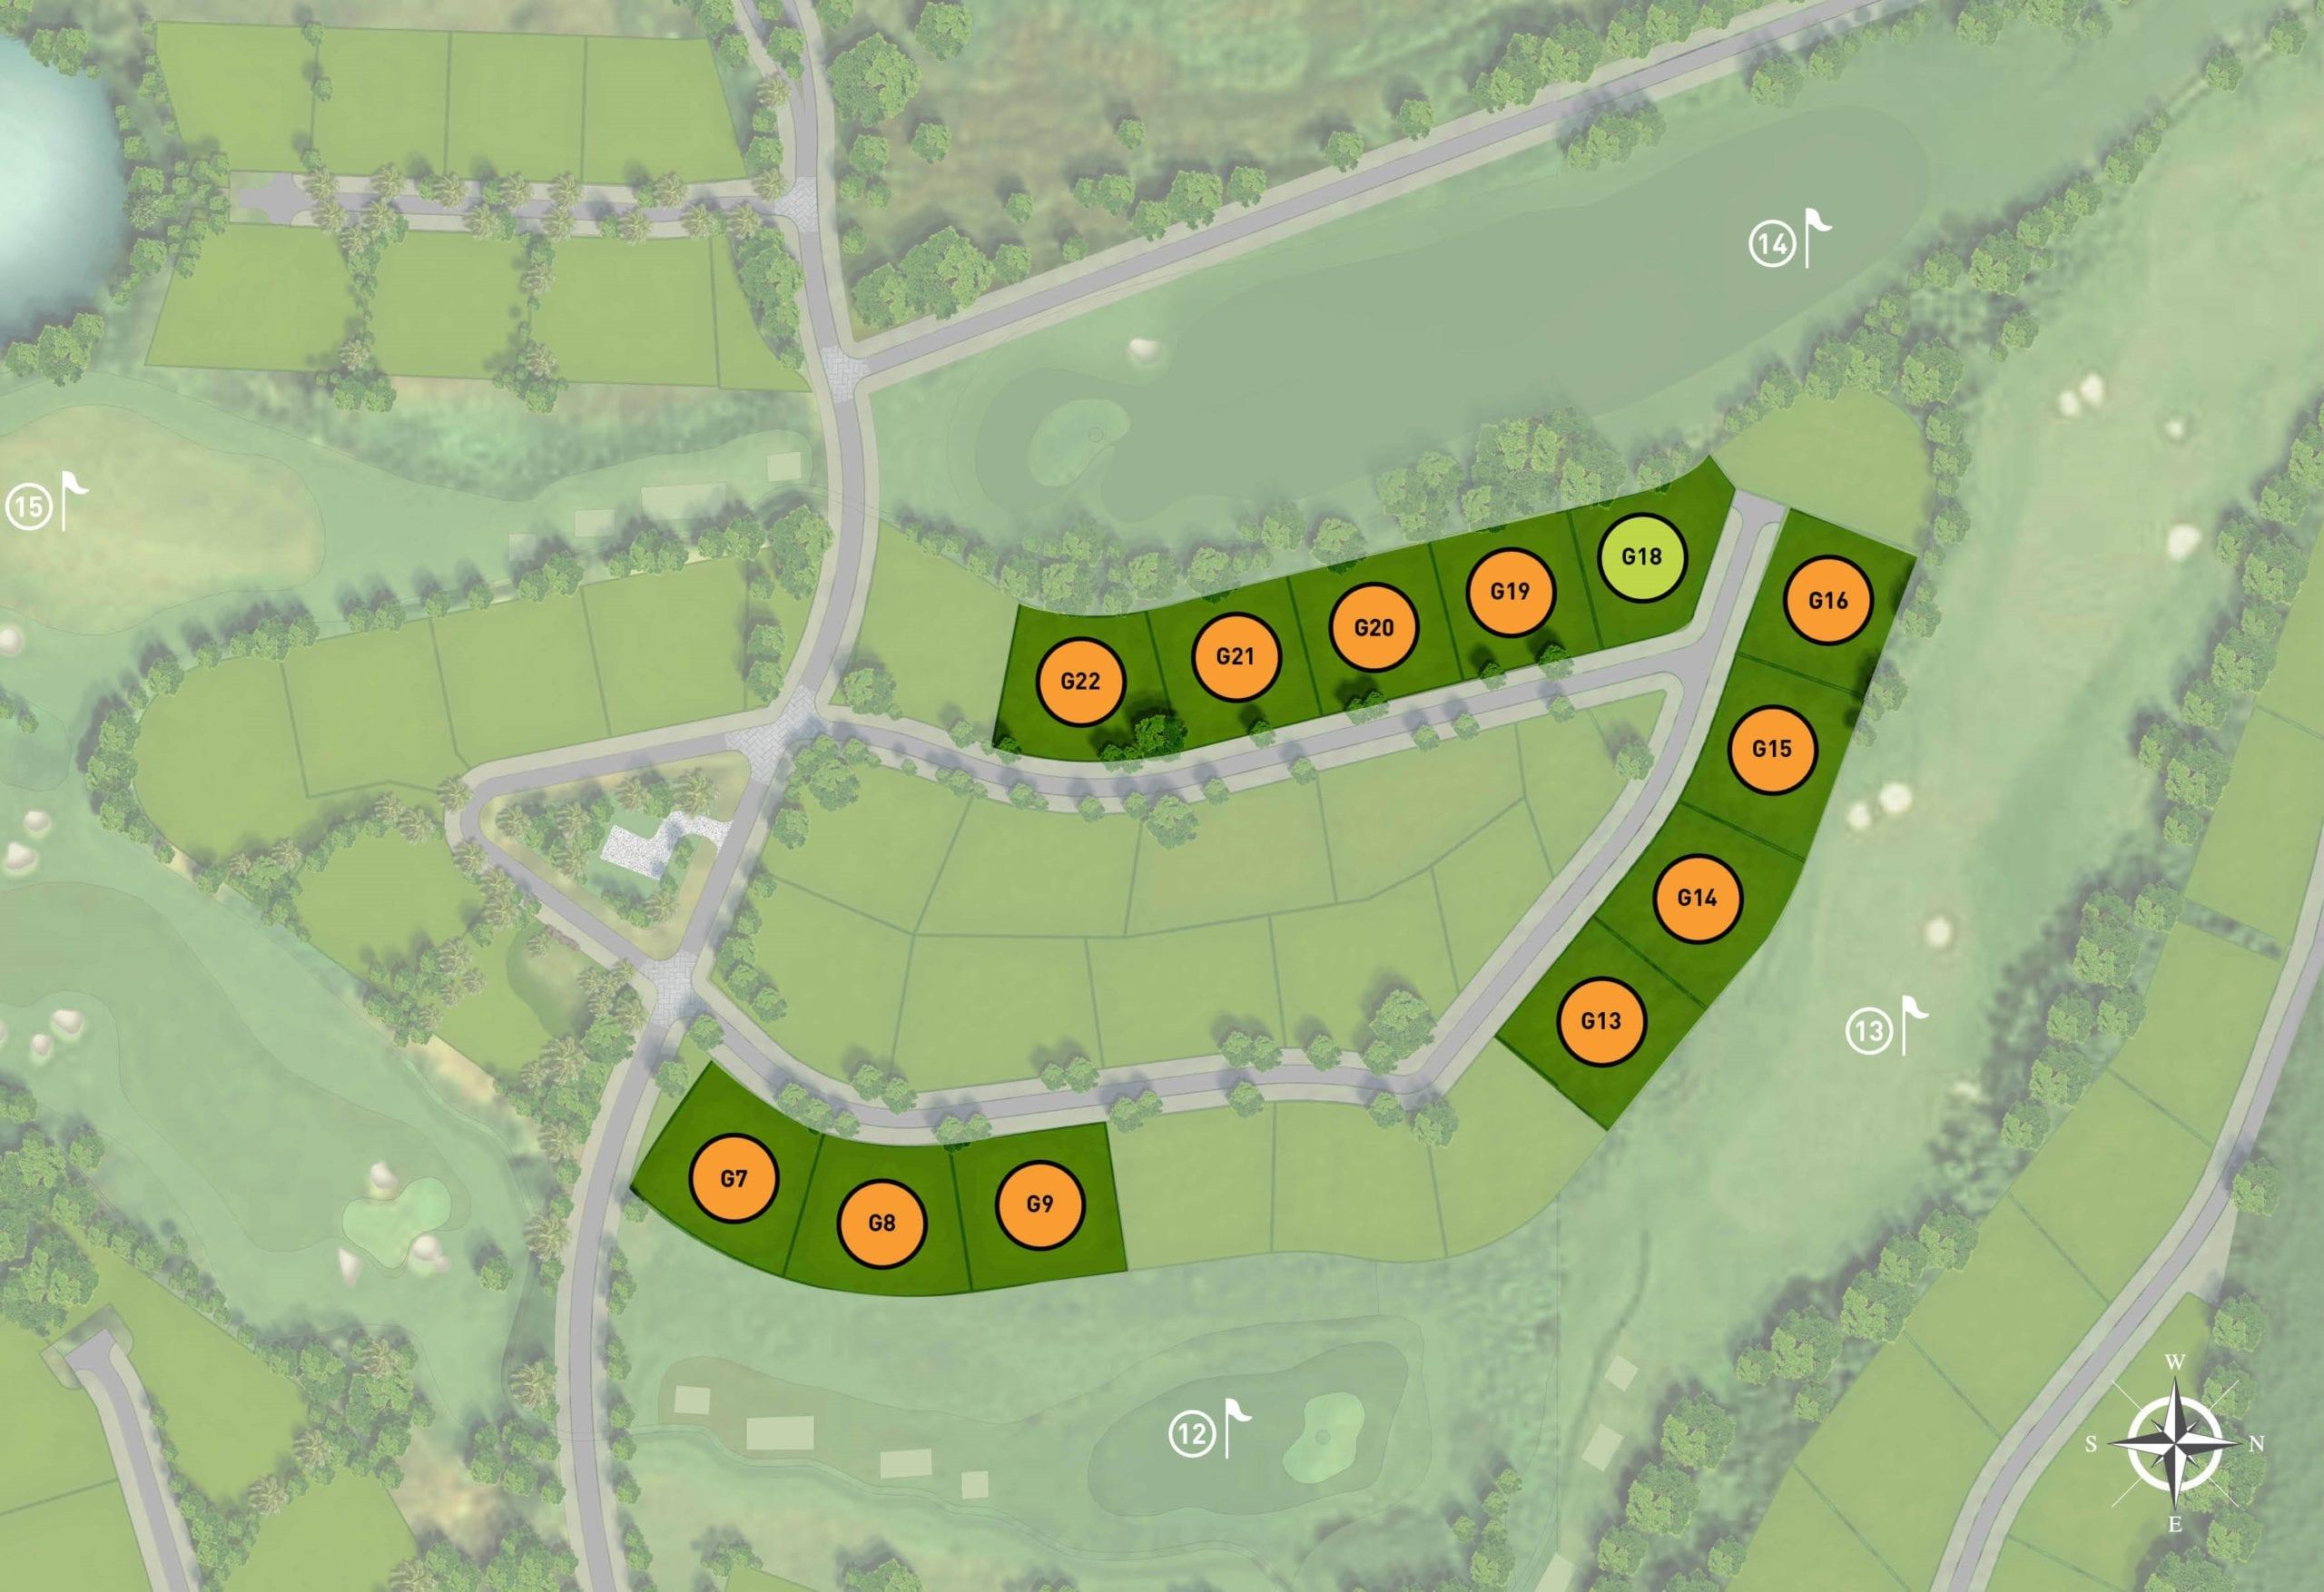 Anahita Mauritius Hedonia golf villas site plan